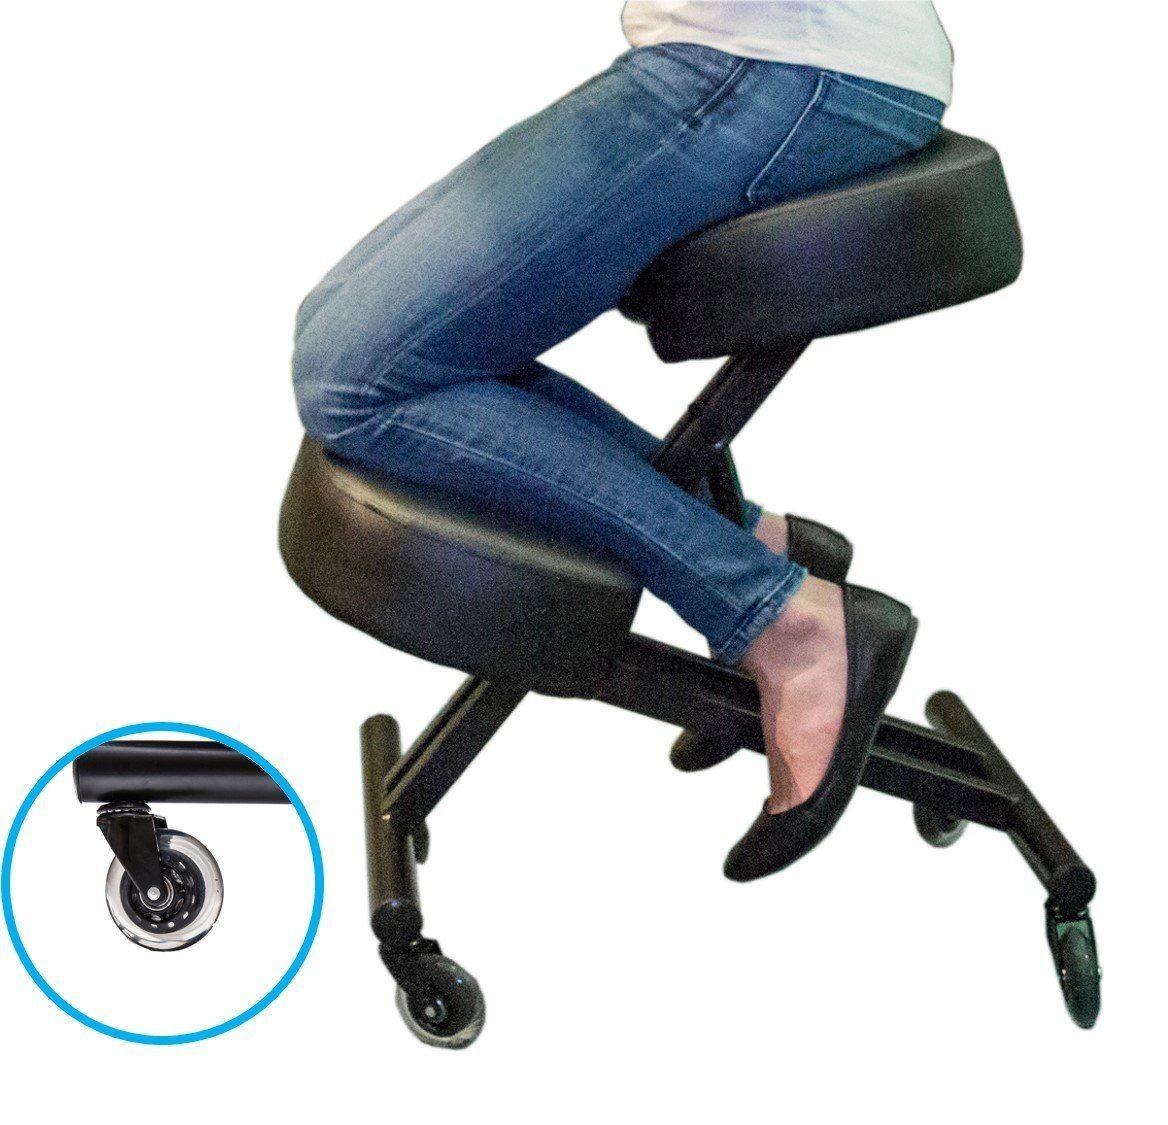 Ergonomic knee stool relieving back kneeling chair